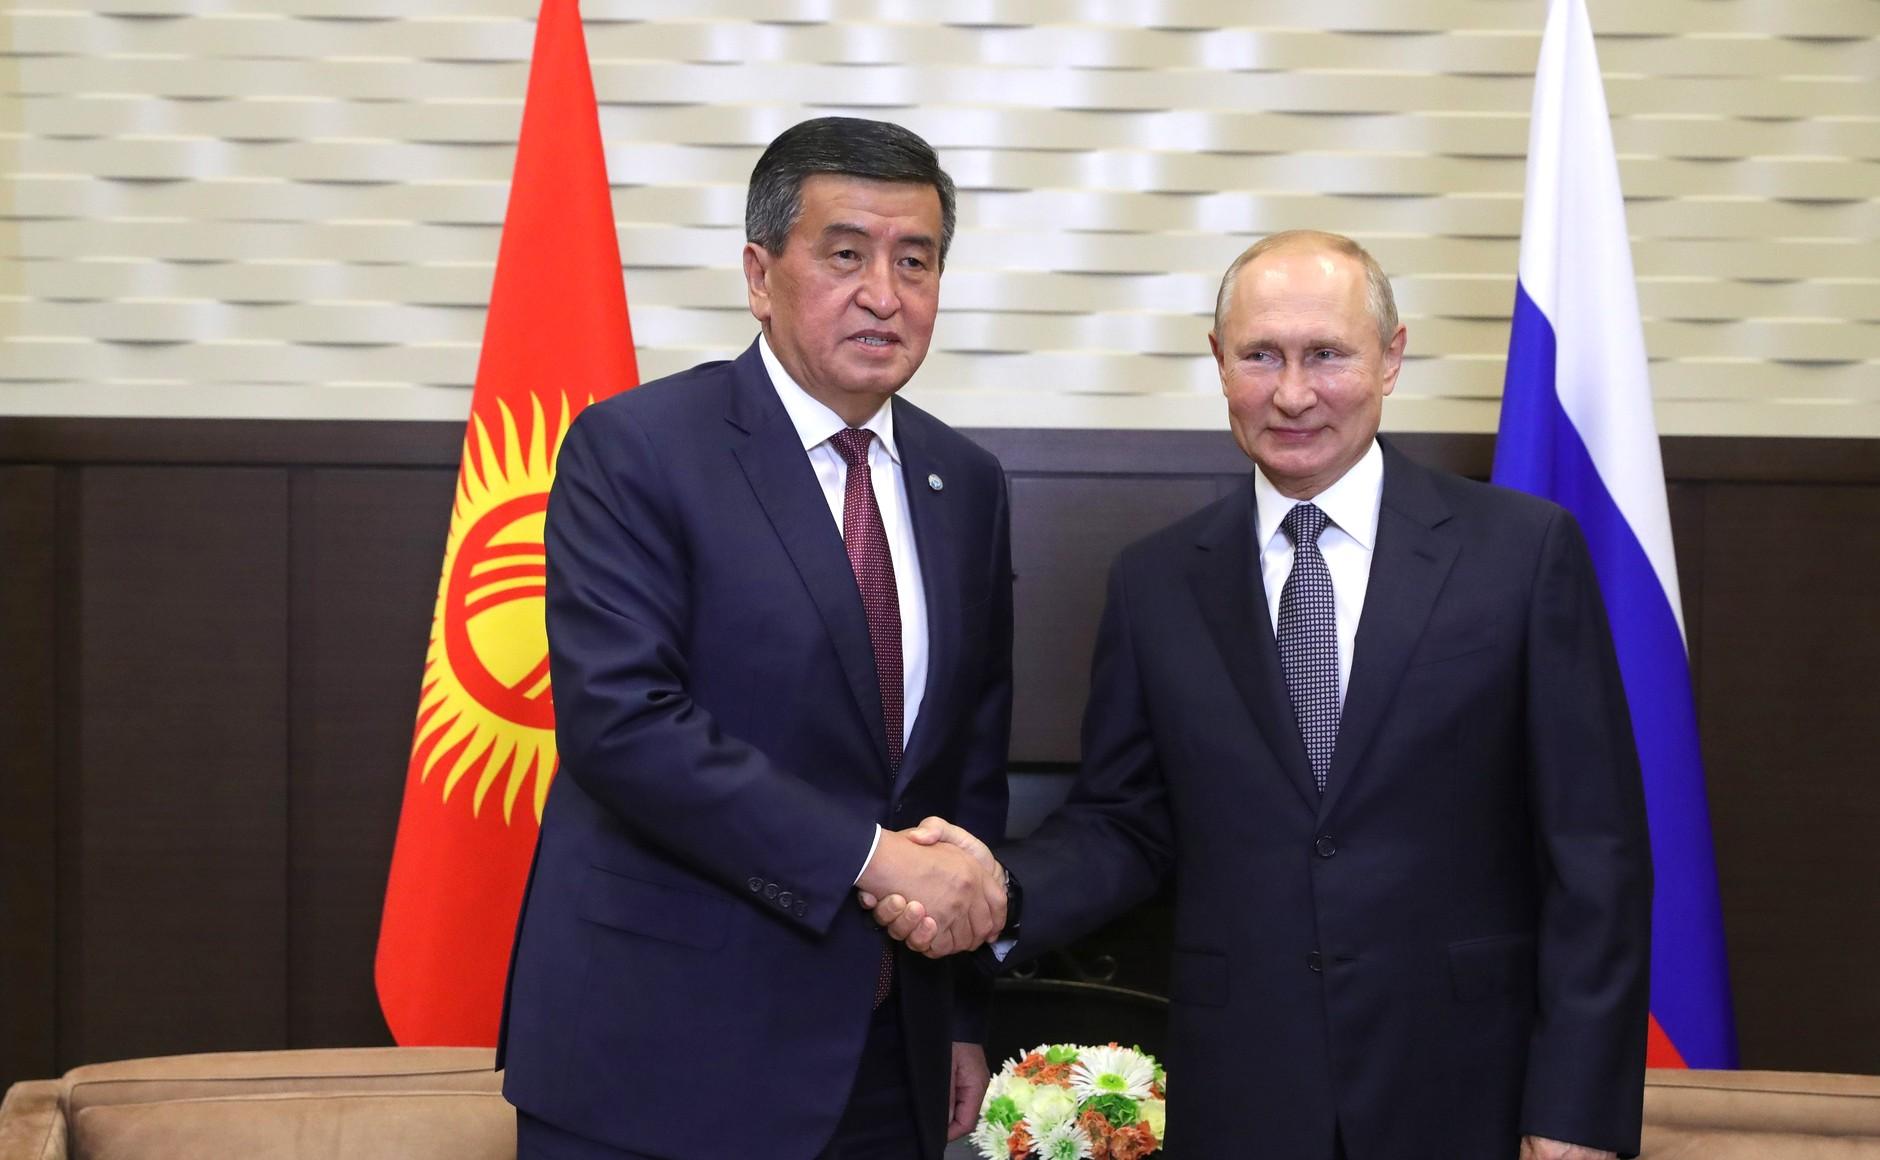 KREMLIN SOCHI PH 3 X 3 DU 28.09.2020 Avec le président de la République kirghize Sooronbay Jeenbekov. Xhqwya5EwaTB0ge2MhIy4s9rUQbWyQAy